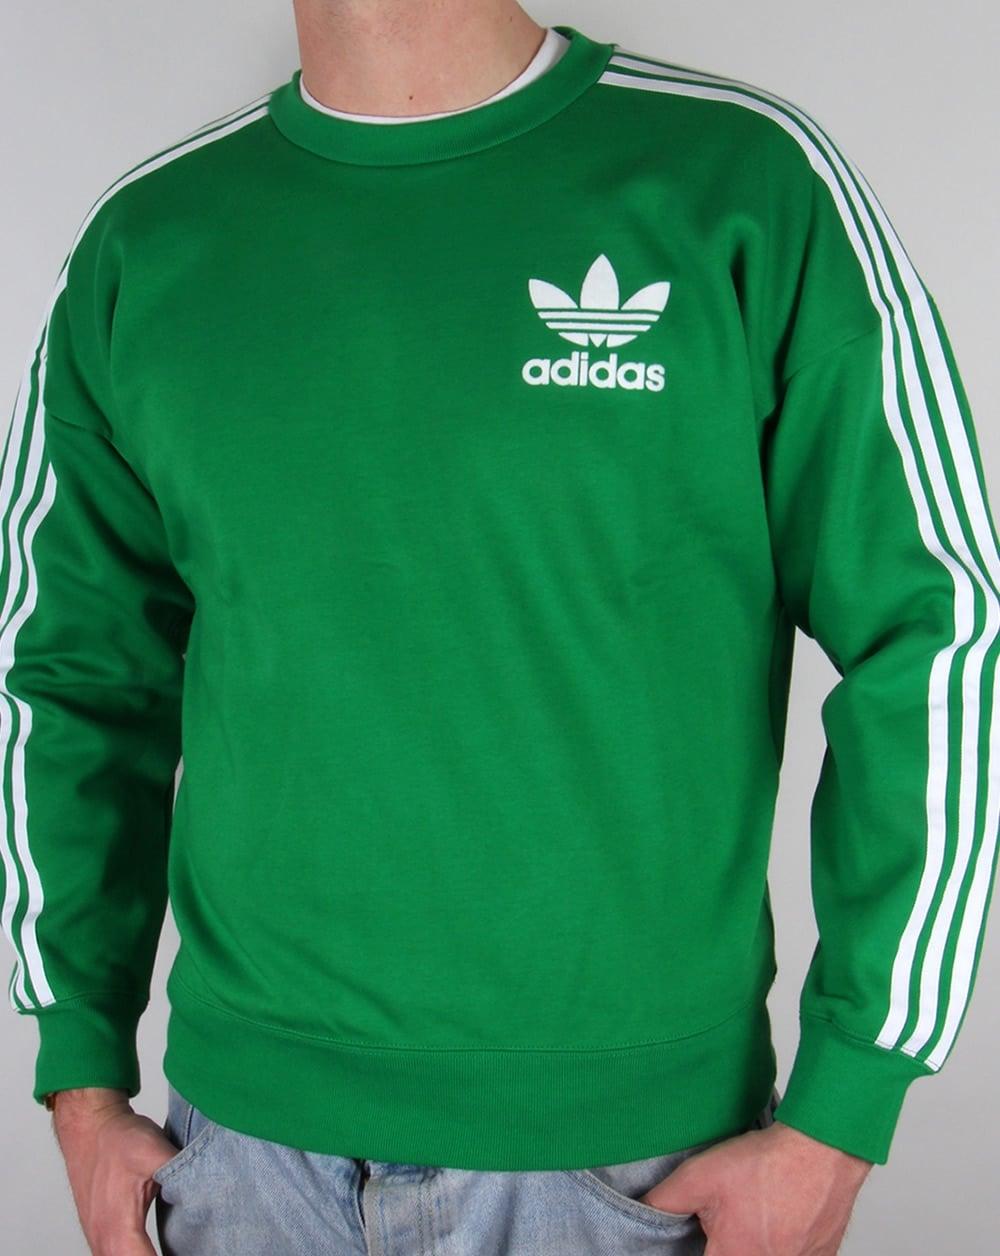 adidas Originals Adidas Originals Adicolour Sweatshirt Green White c0e1b9cf98d5